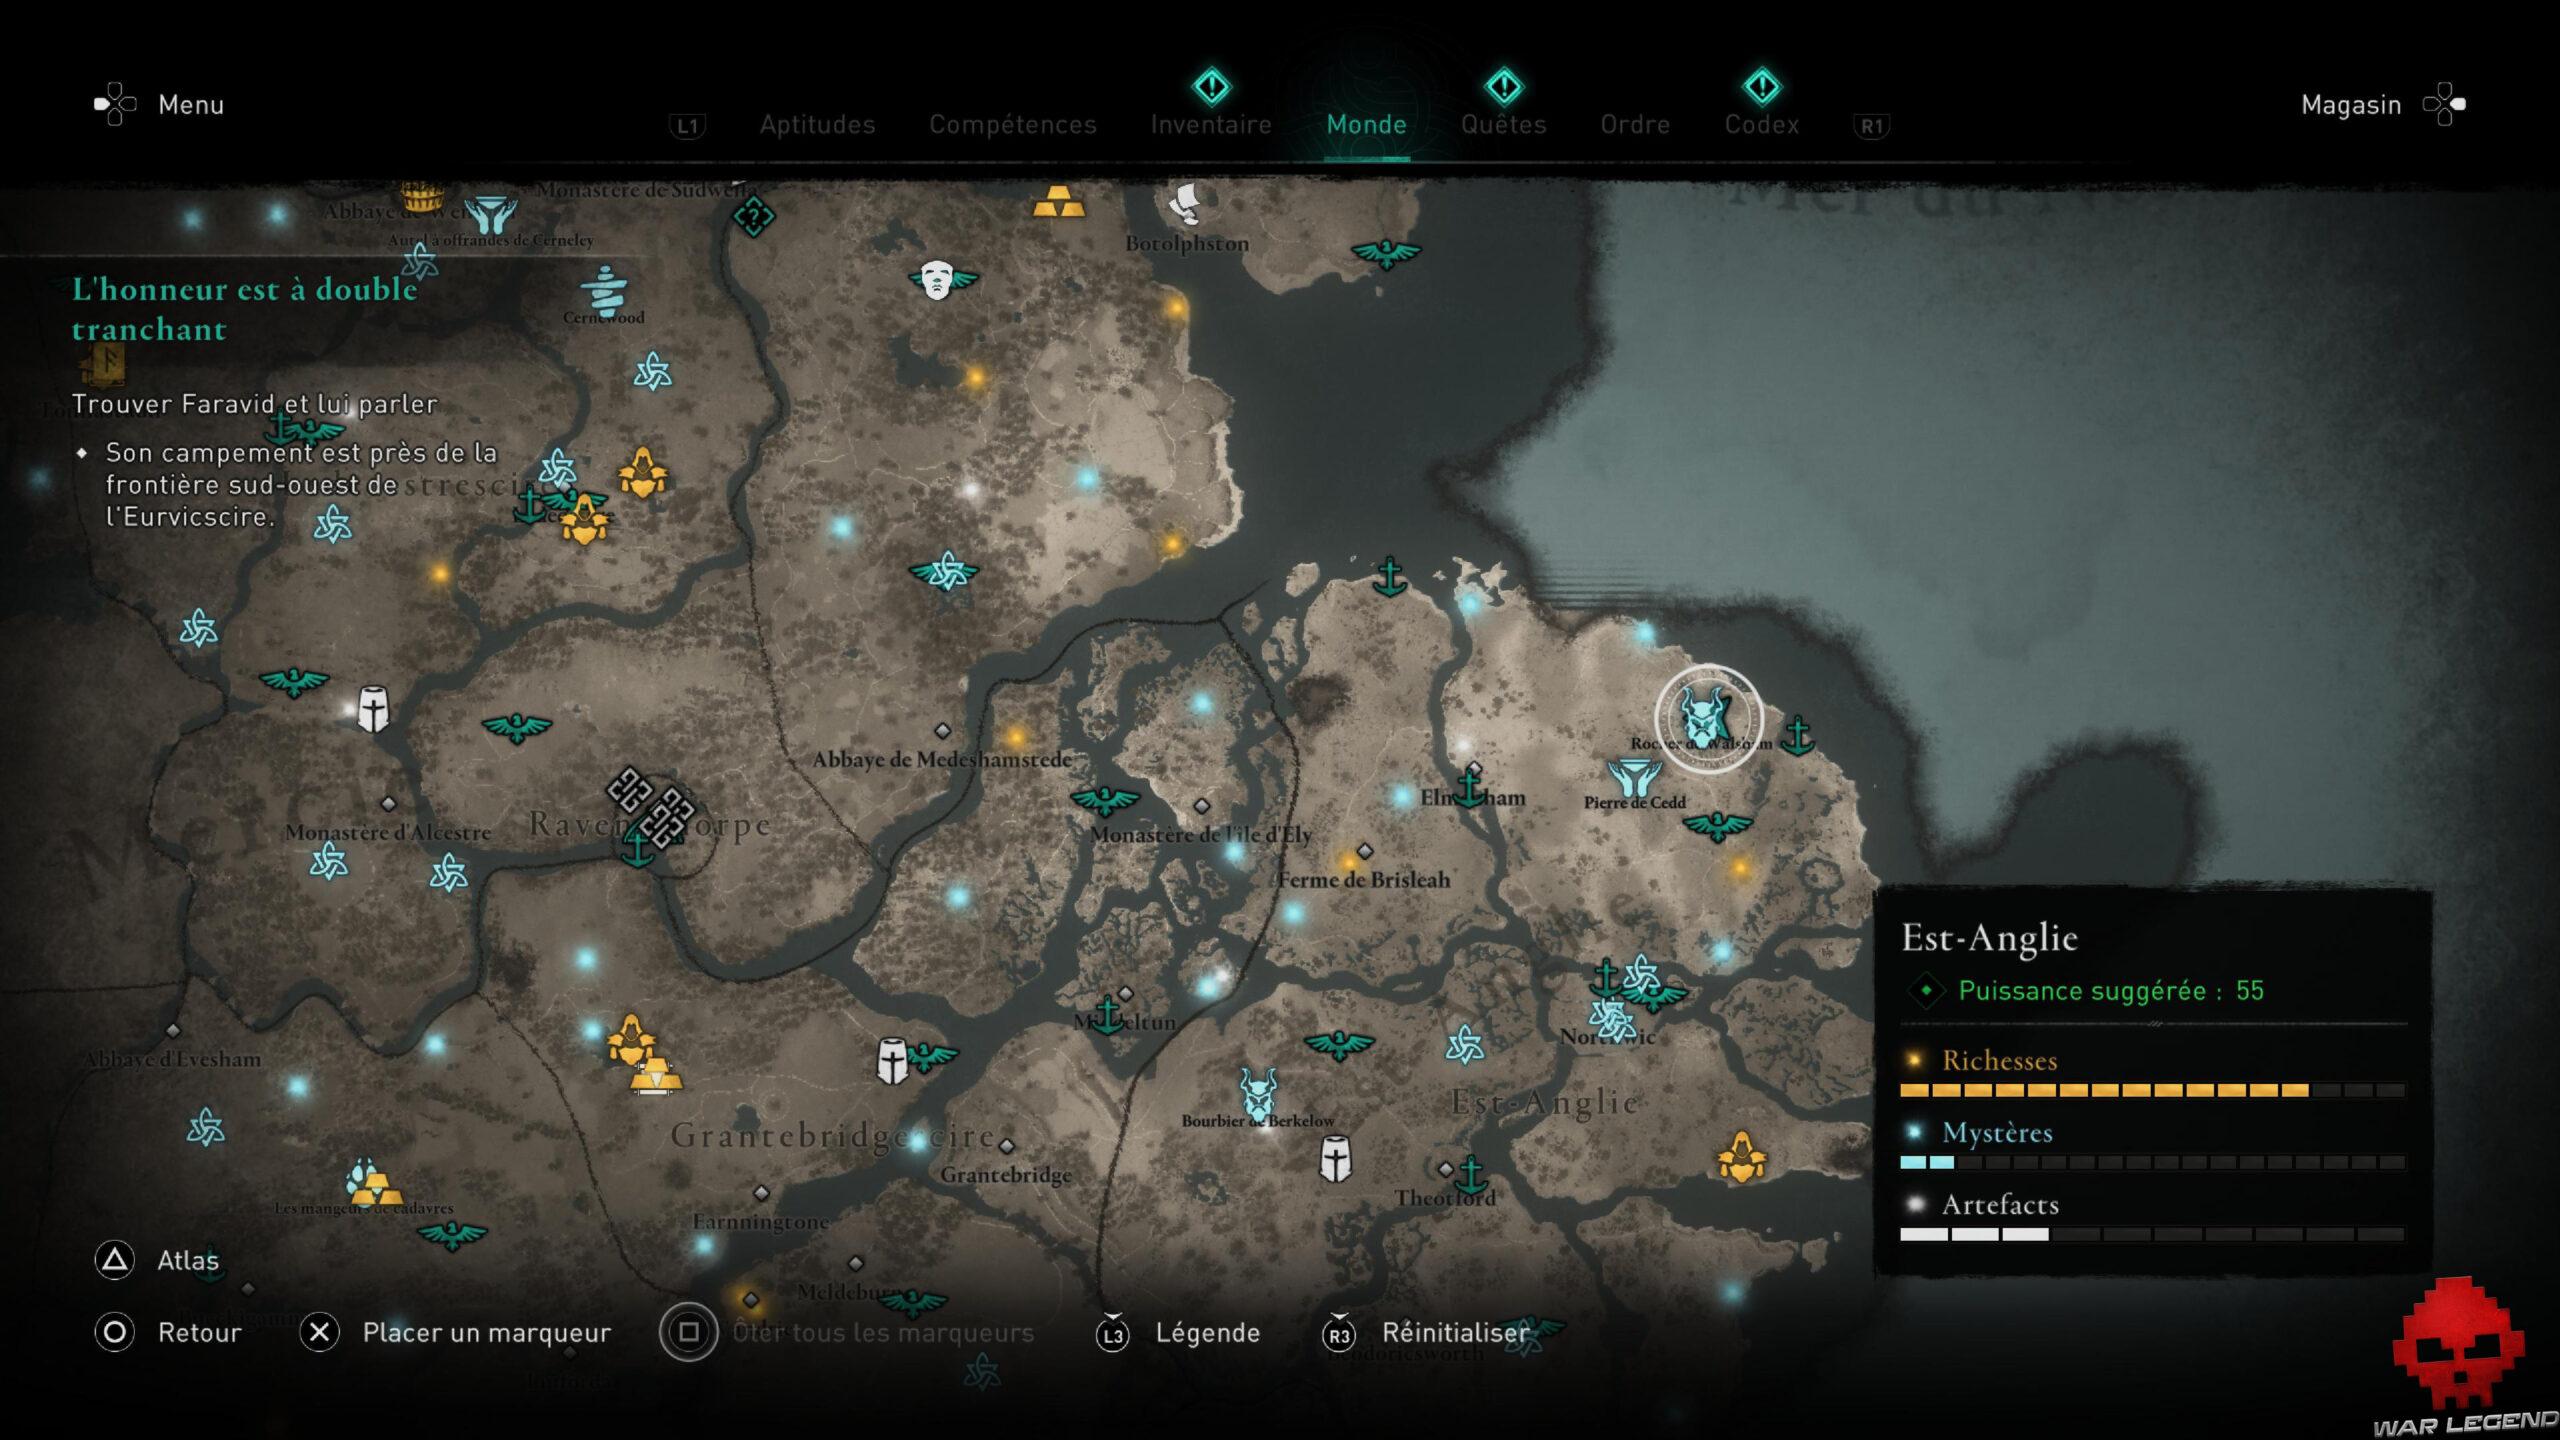 Carte Est-Anglie Assassin's Creed Valhalla